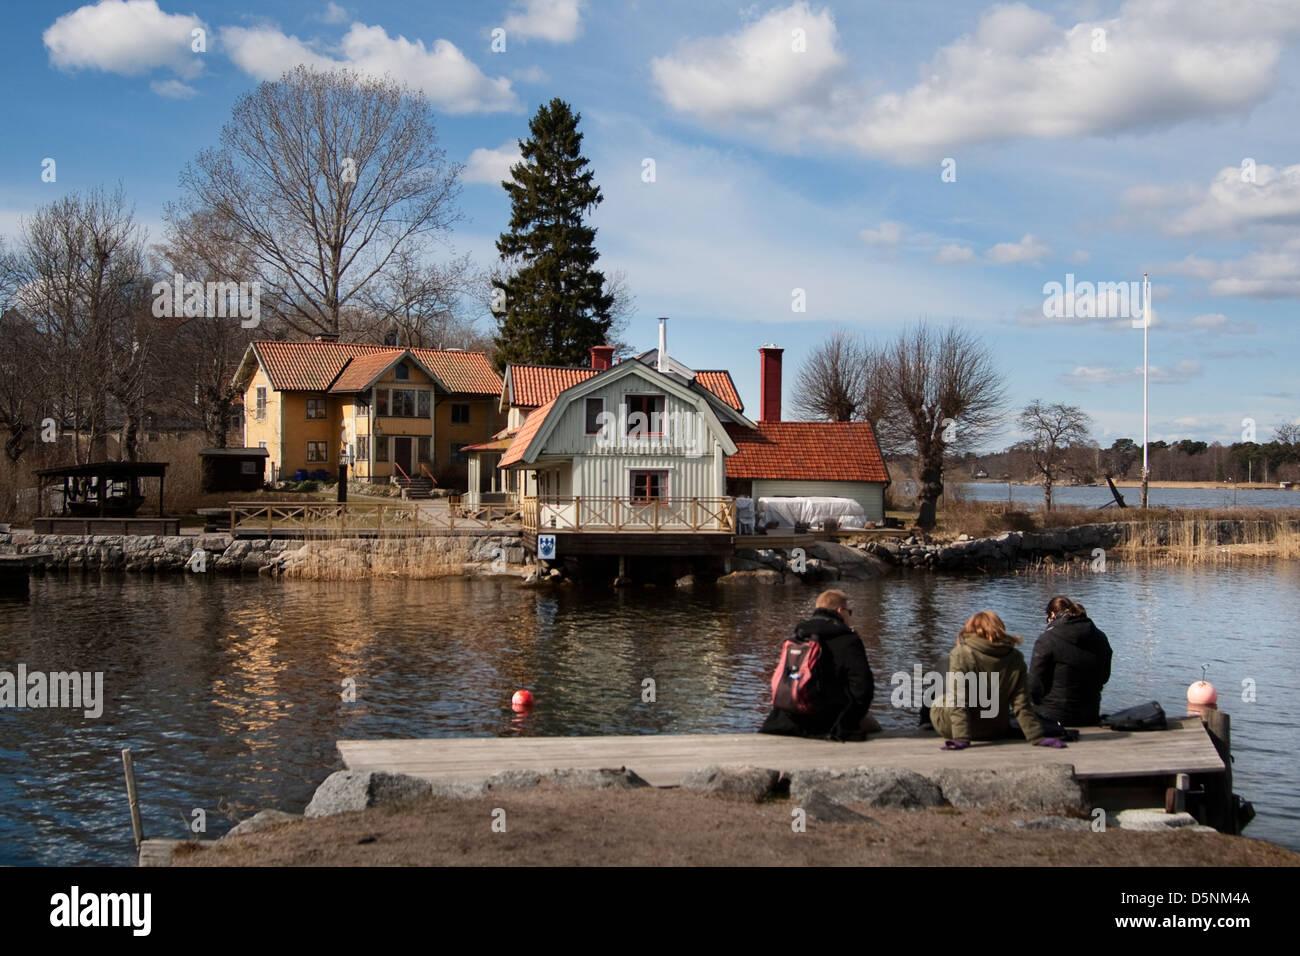 Scandinavia Sweden Swedish Stockholm Baltic Sea Island Archipelago Vaxholm Wood House Typical Boat Dock Peple: Sitting - Stock Image